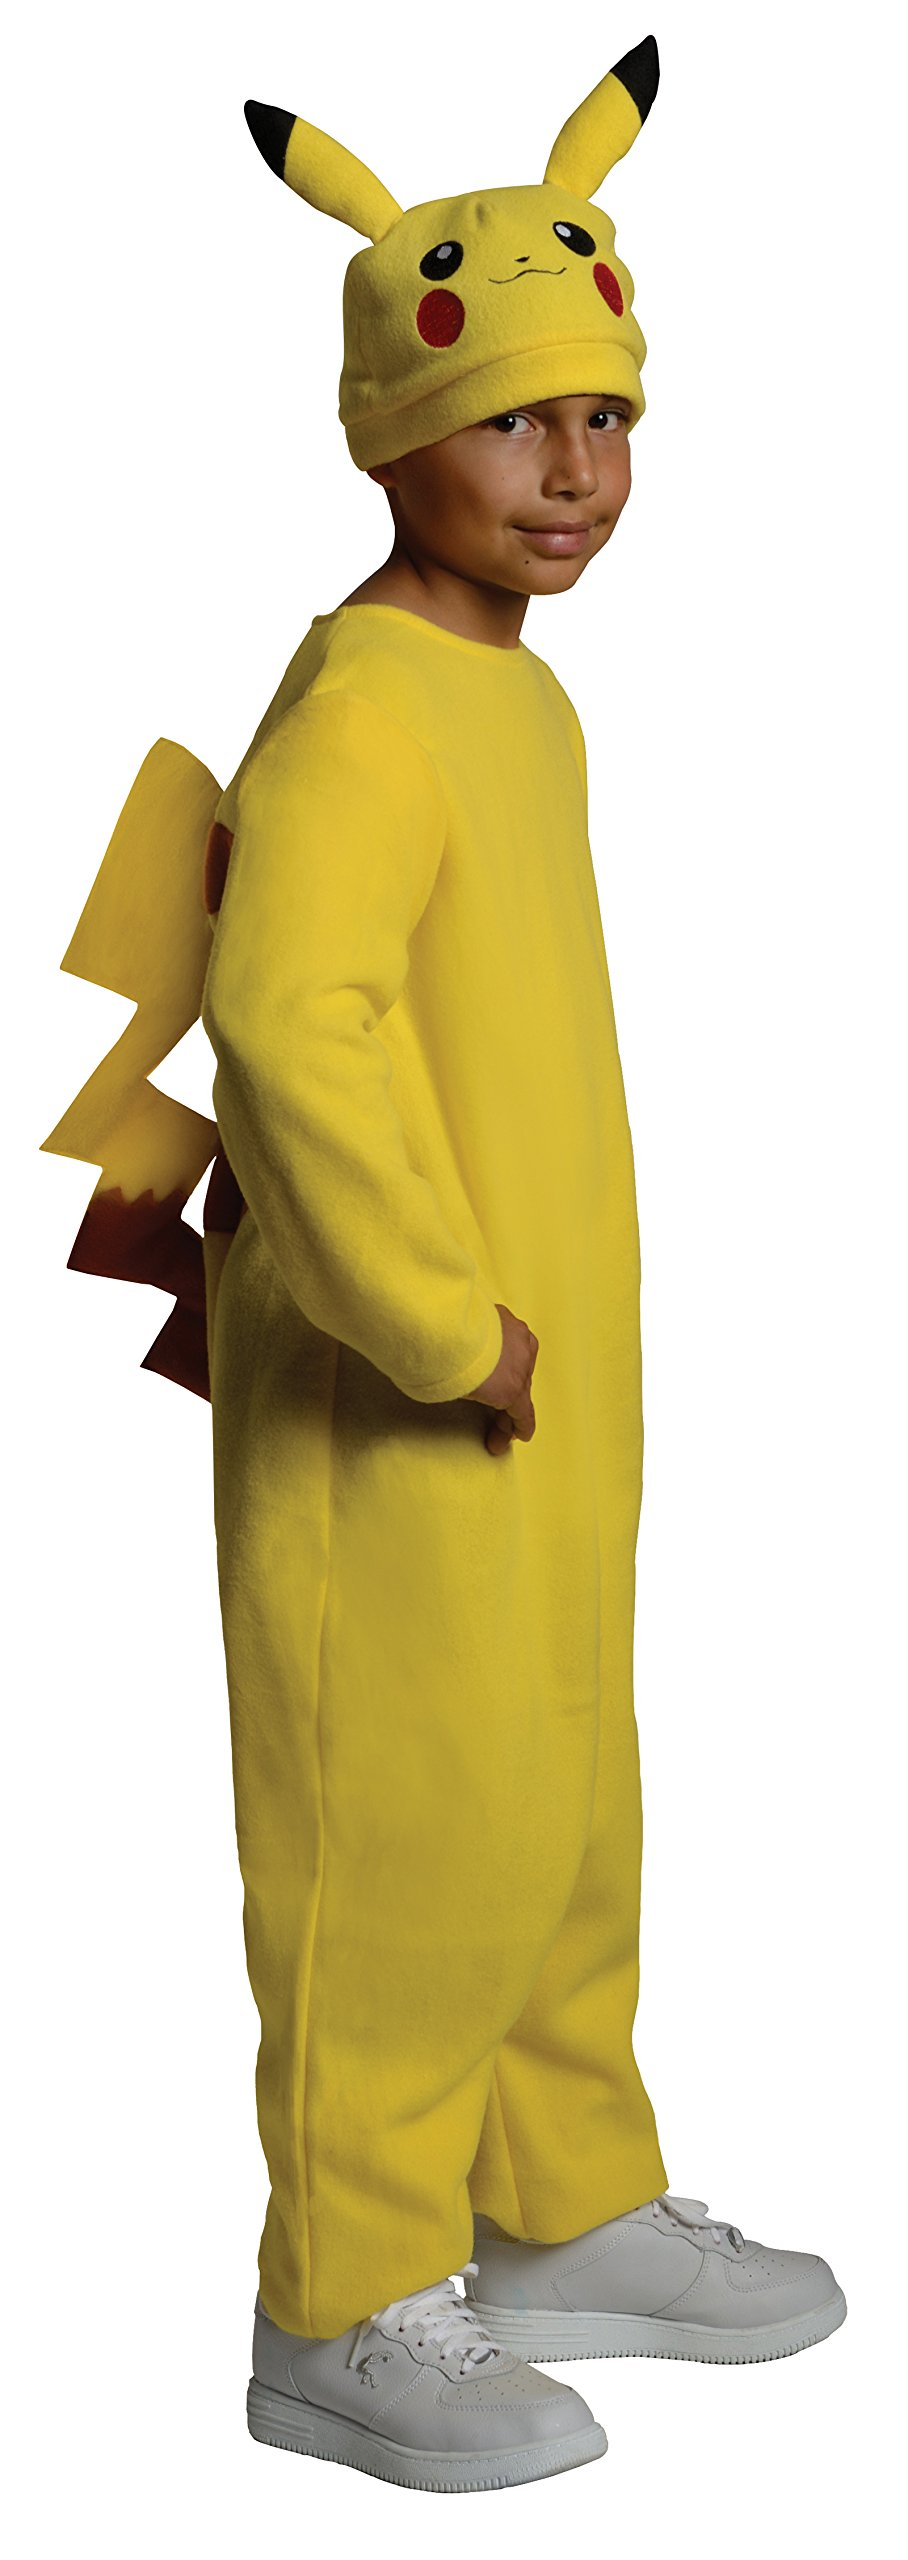 Pokemon Child's Deluxe Pikachu Costume - One Color - Small